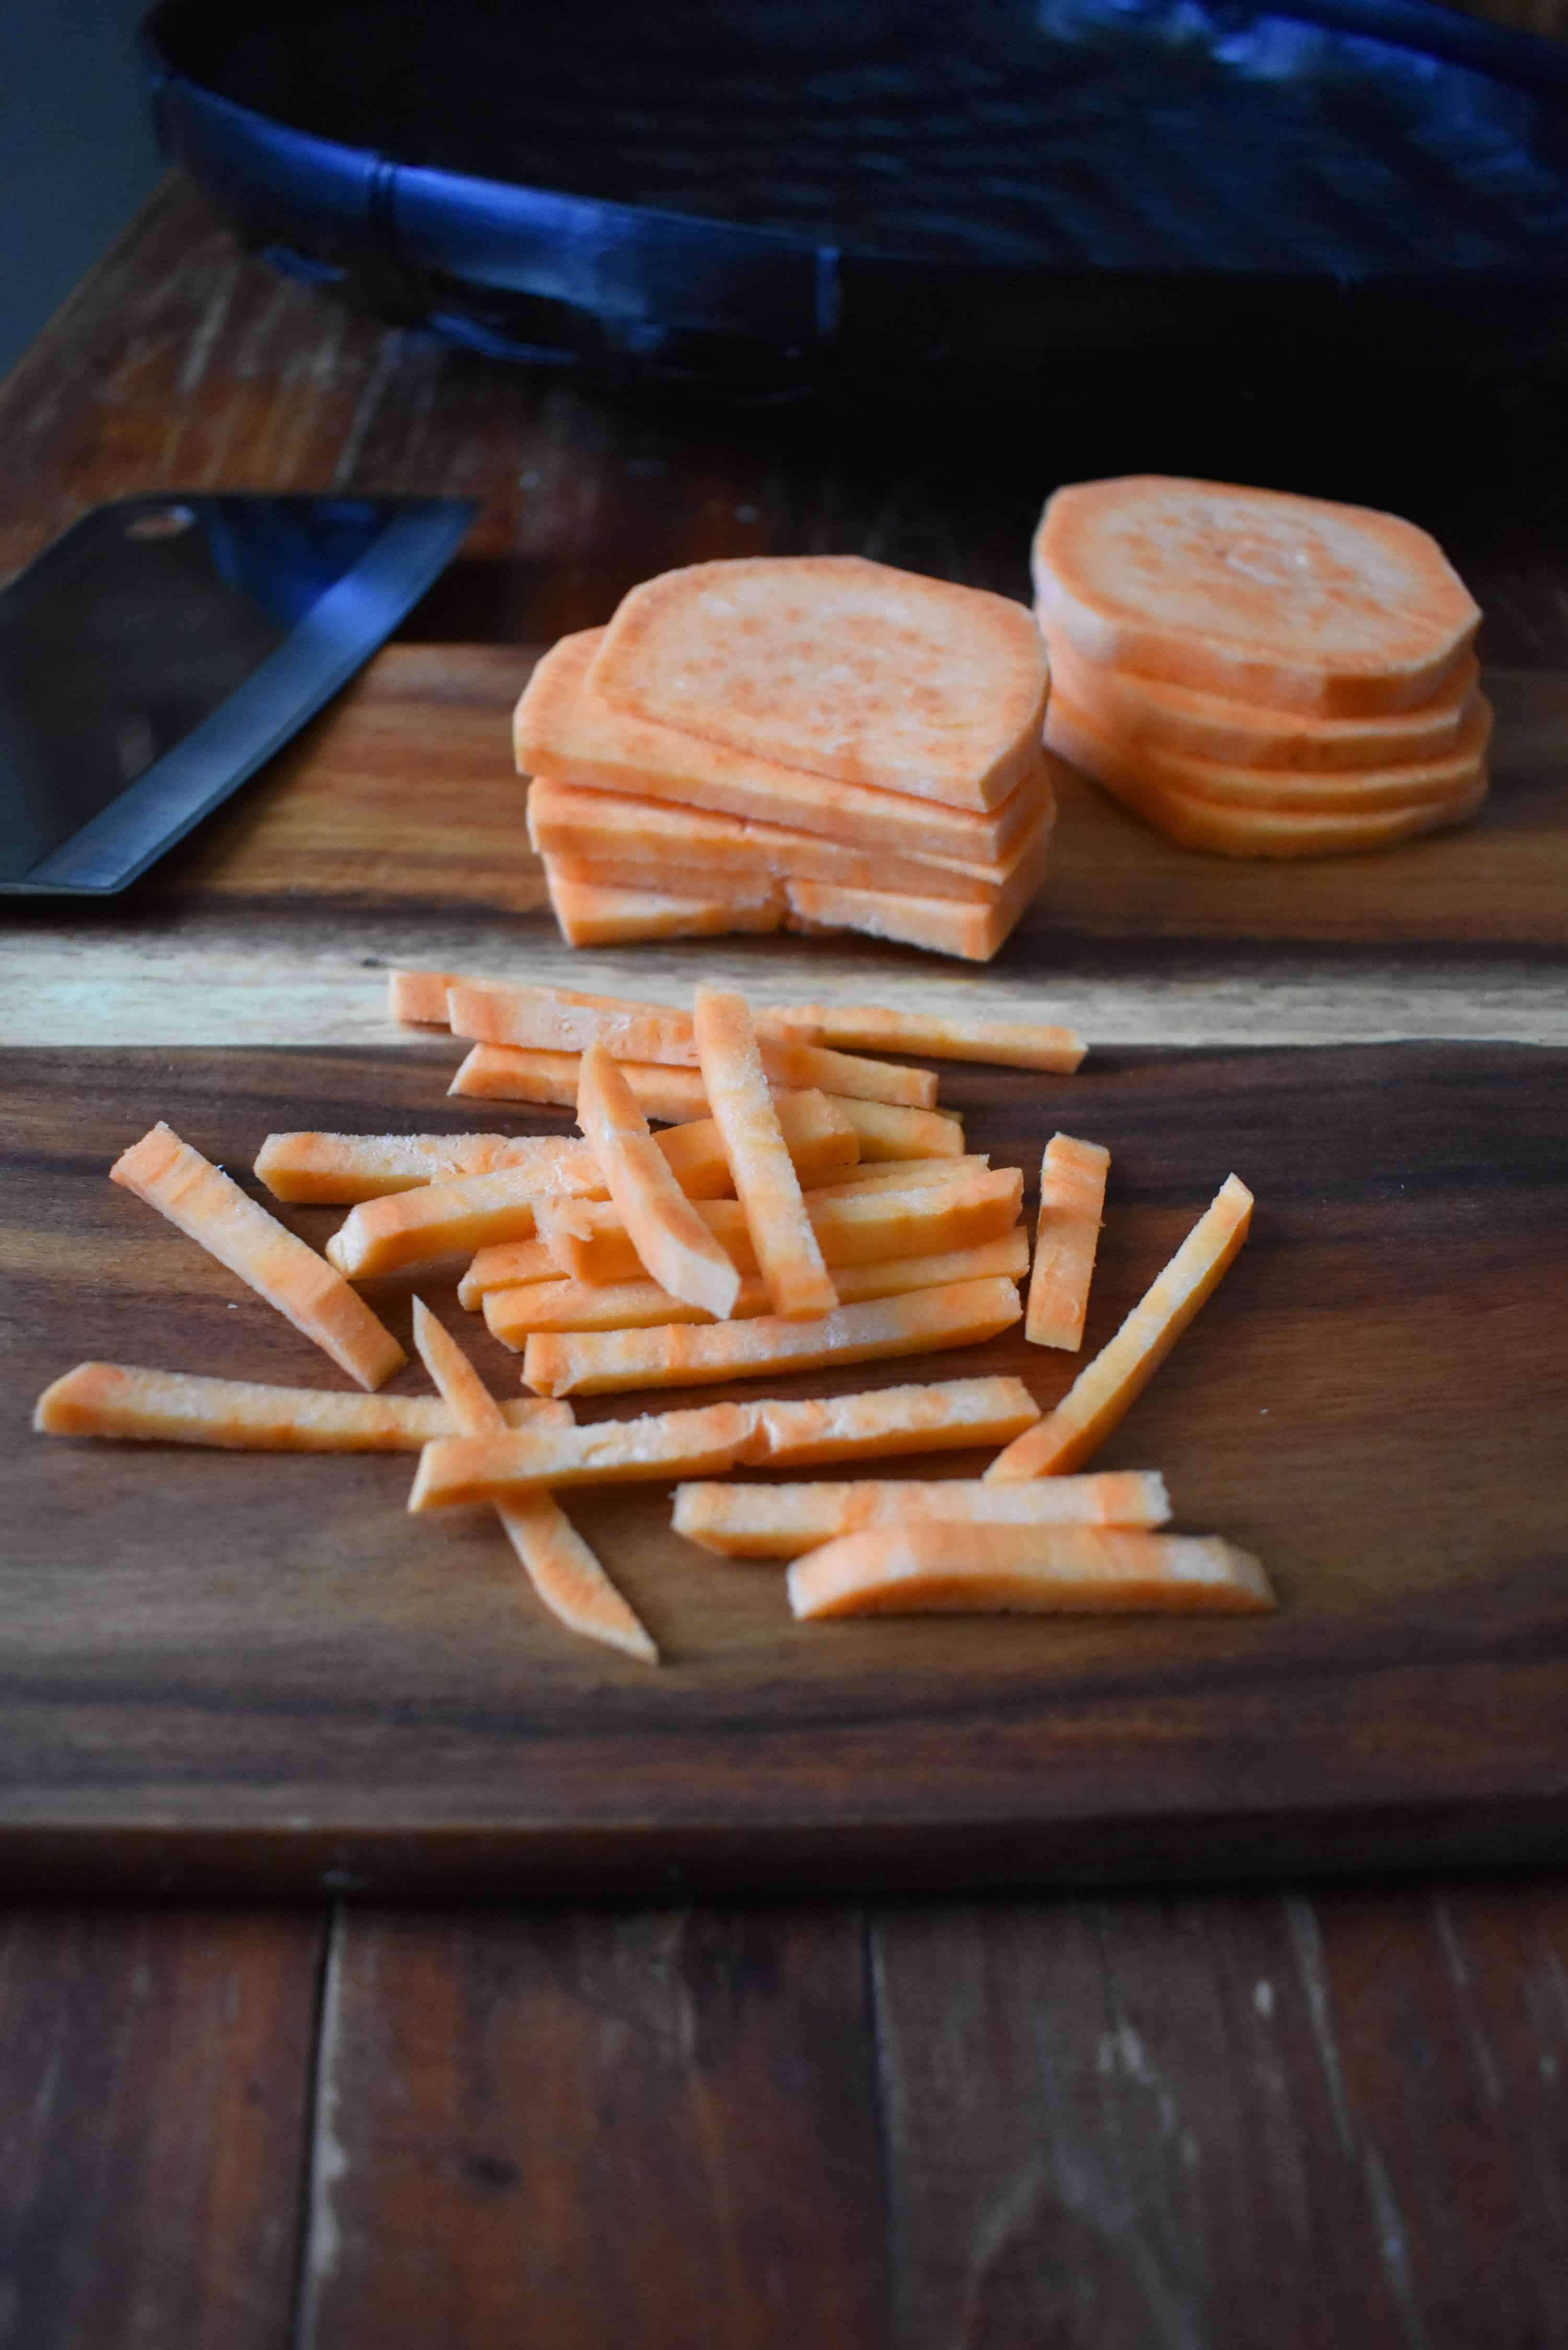 Cutting sweet potato into thin strips.